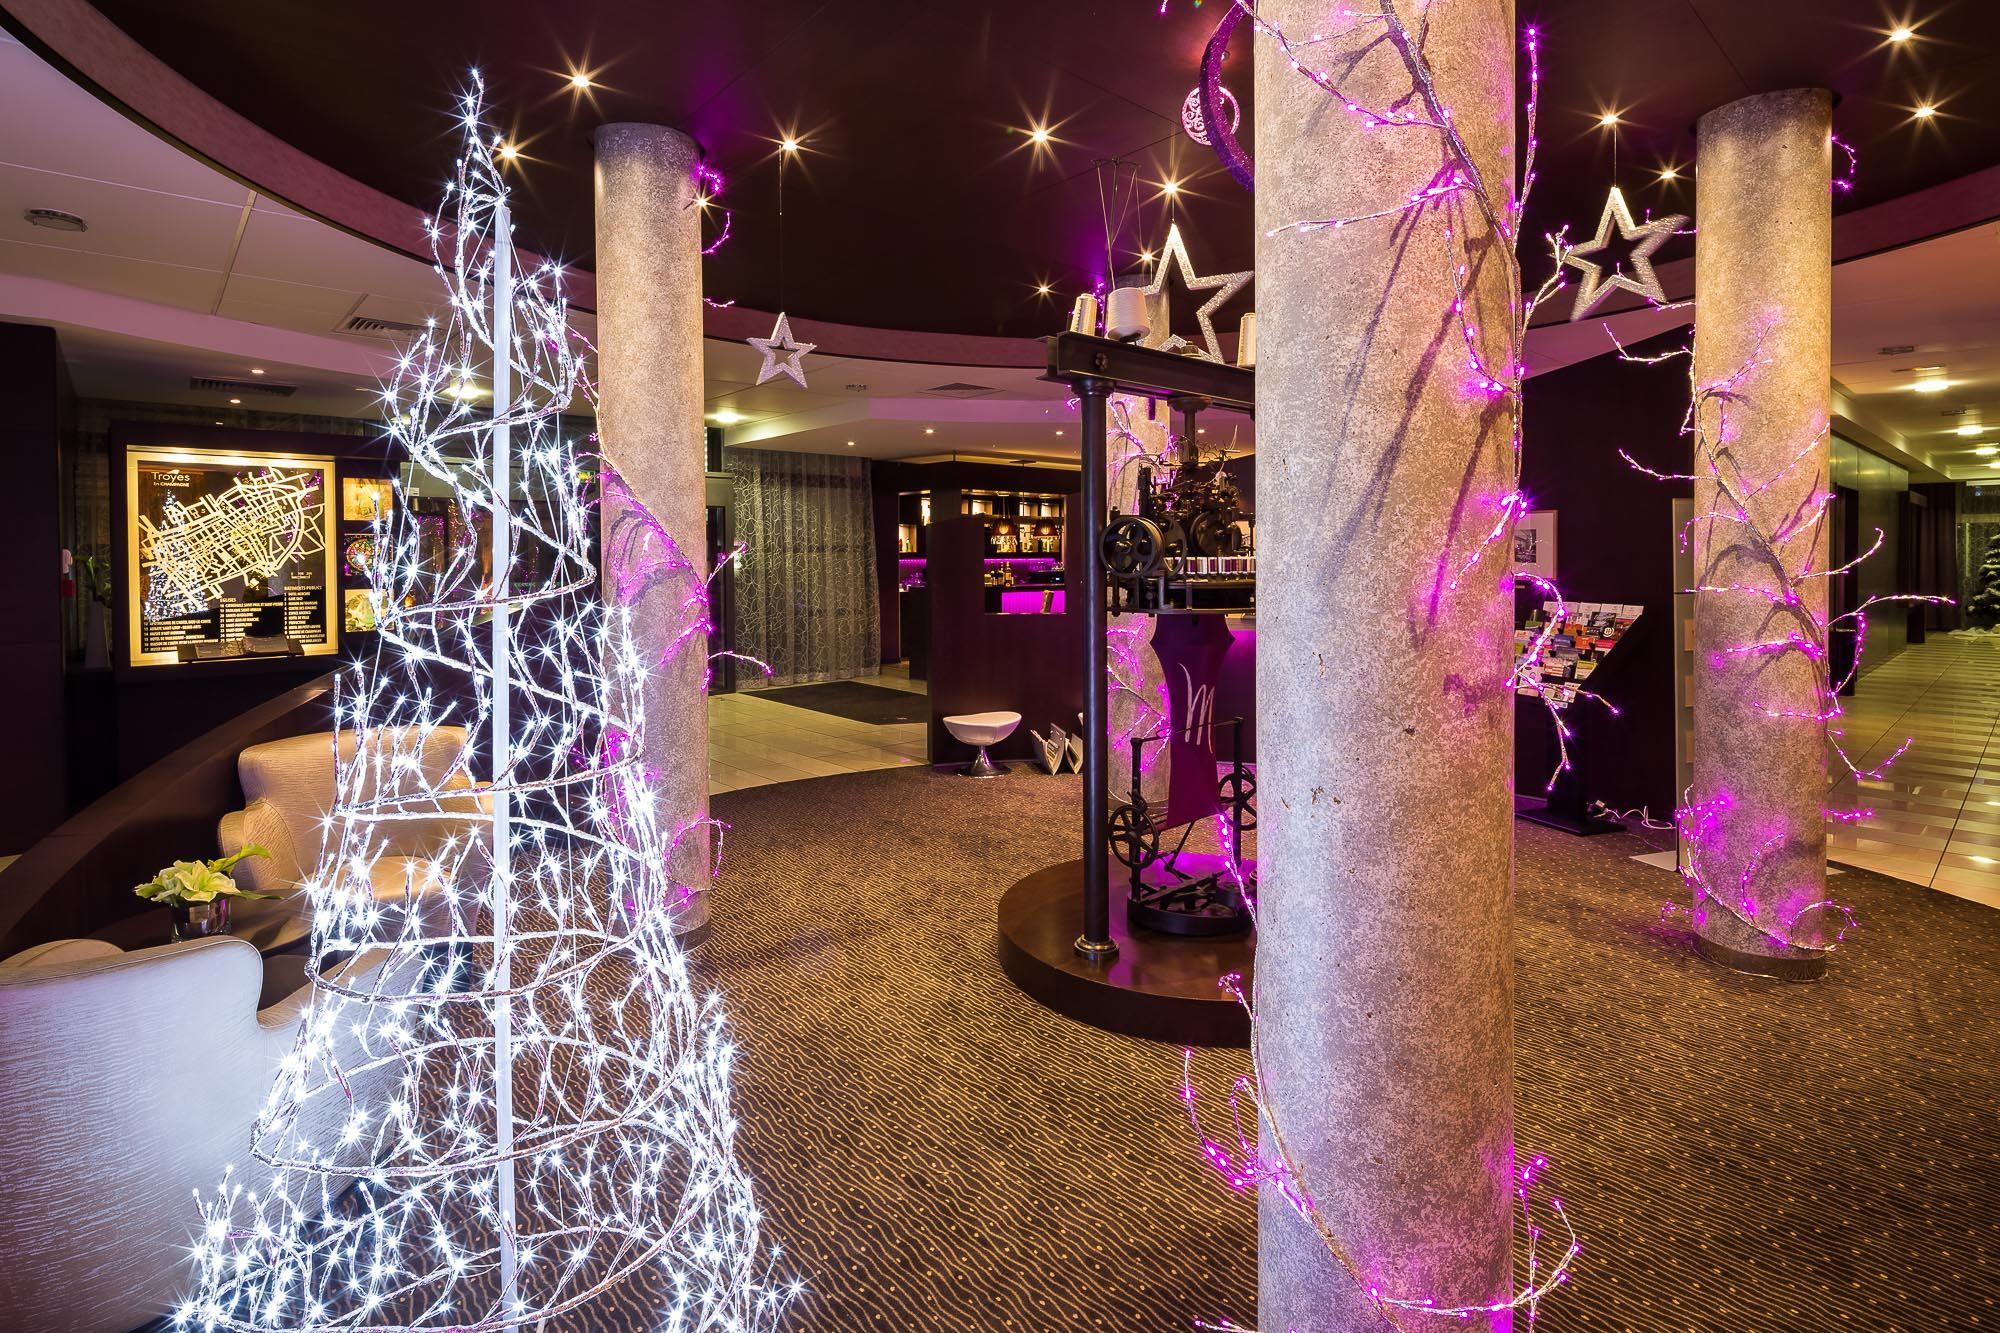 Hotel Mercure Troyes C Festilight Hotel Hotel Restaurant Concession Automobile